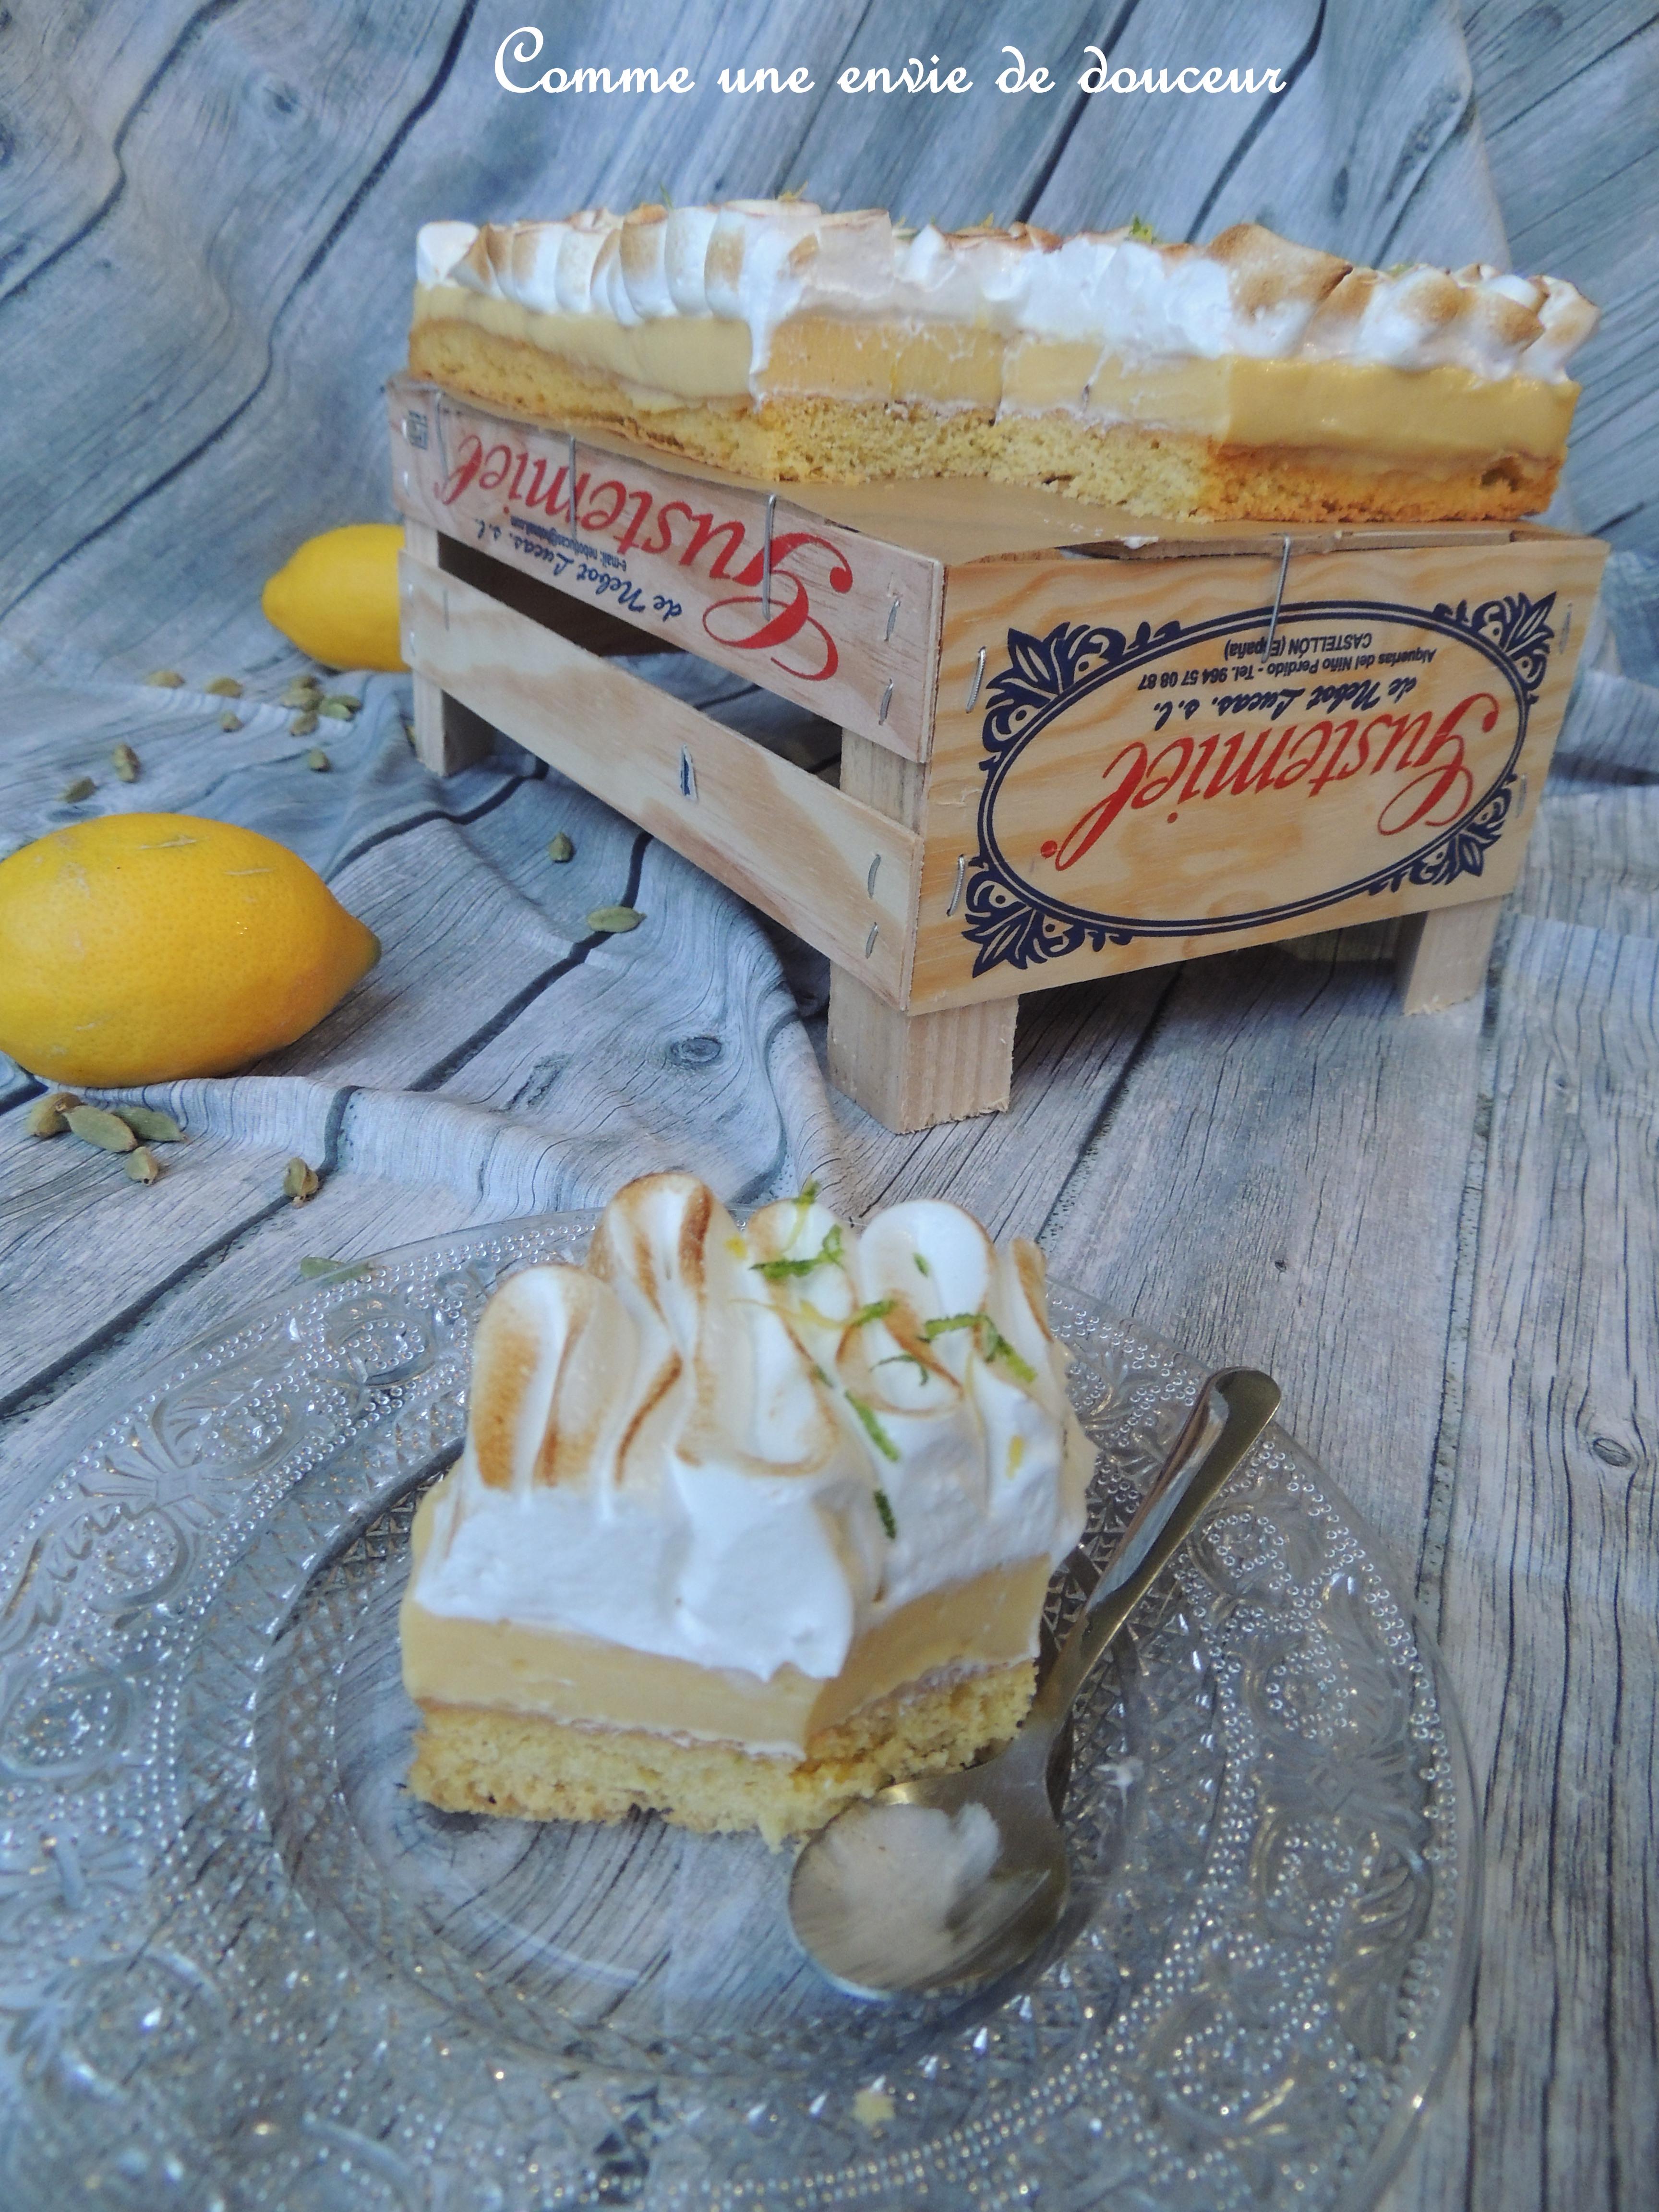 Tarte au citron & cardamome meringuée – Lemon & cardamom meringue pie